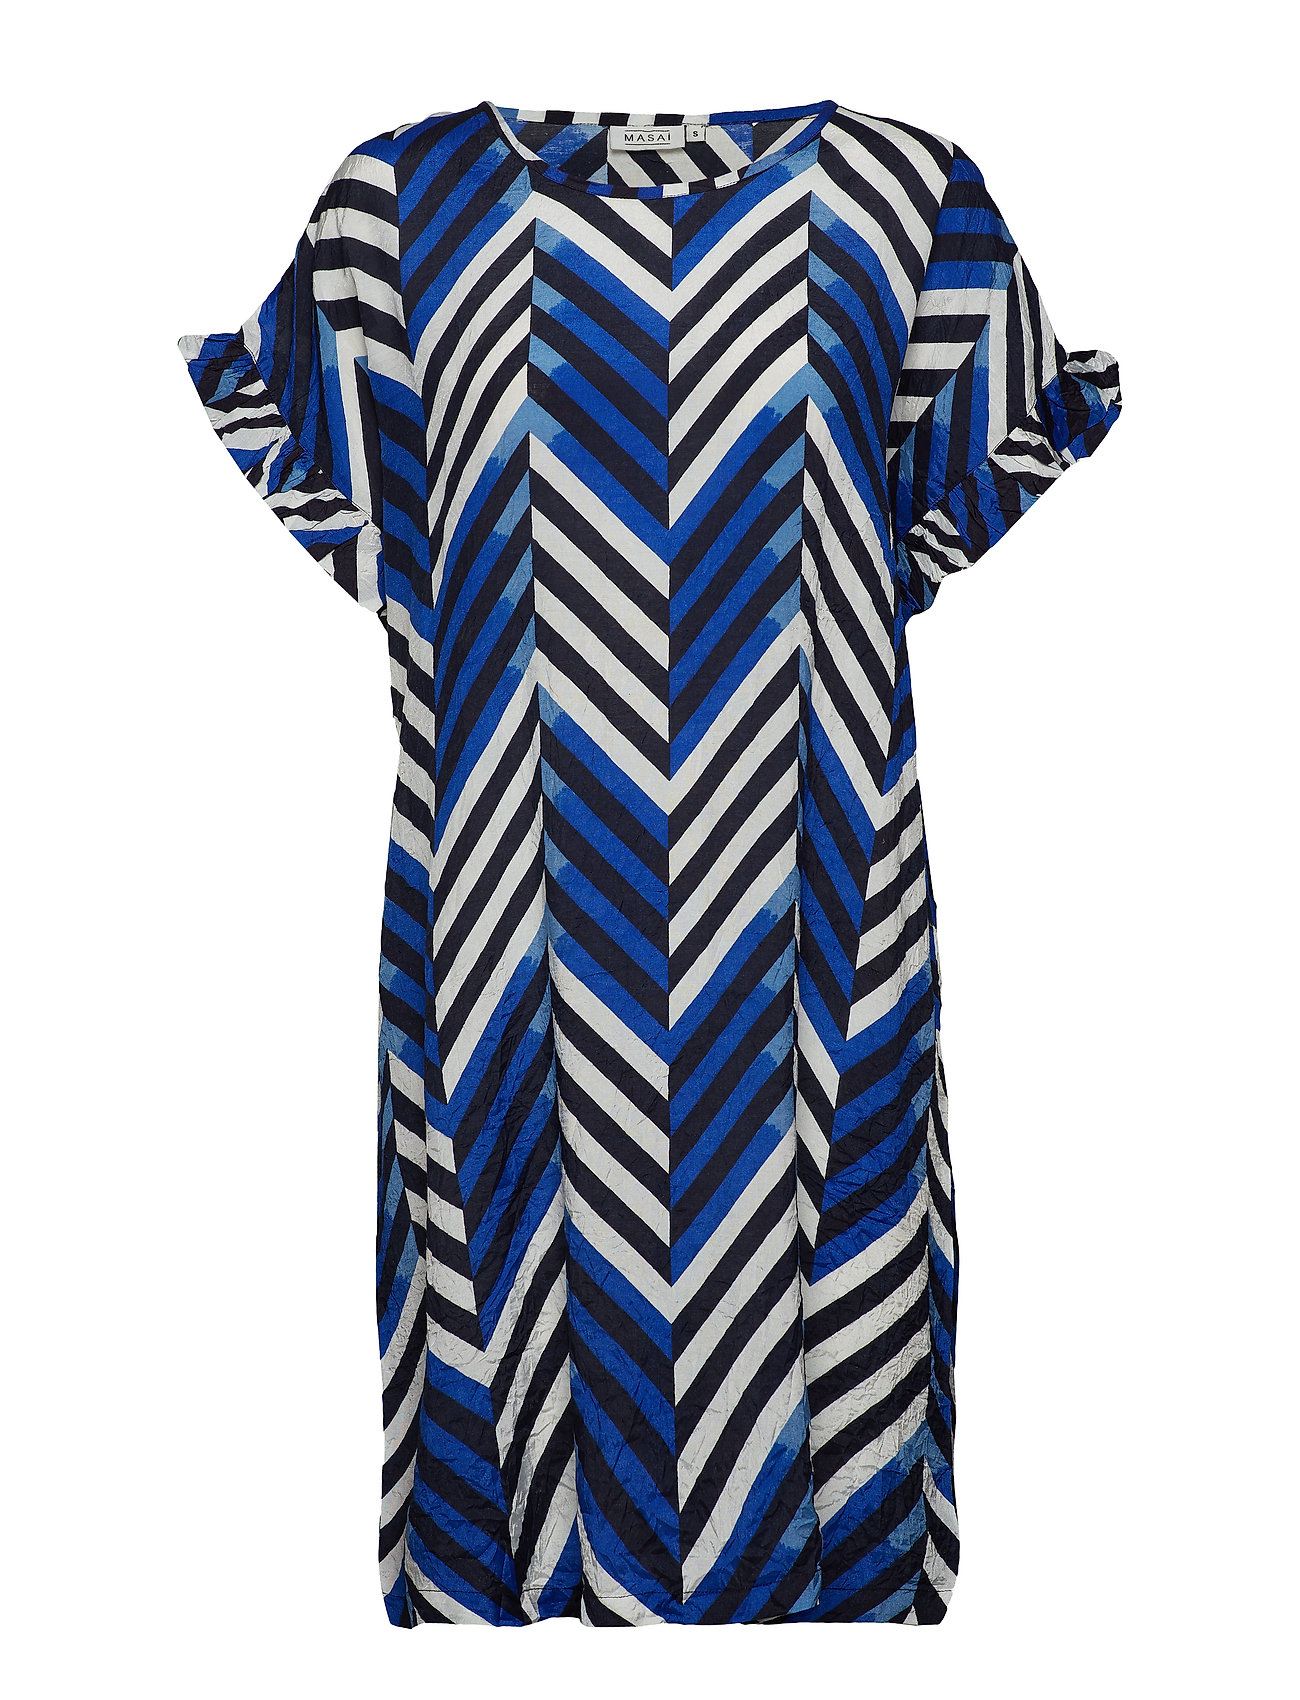 Masai Nara dress - G BLUE ORG